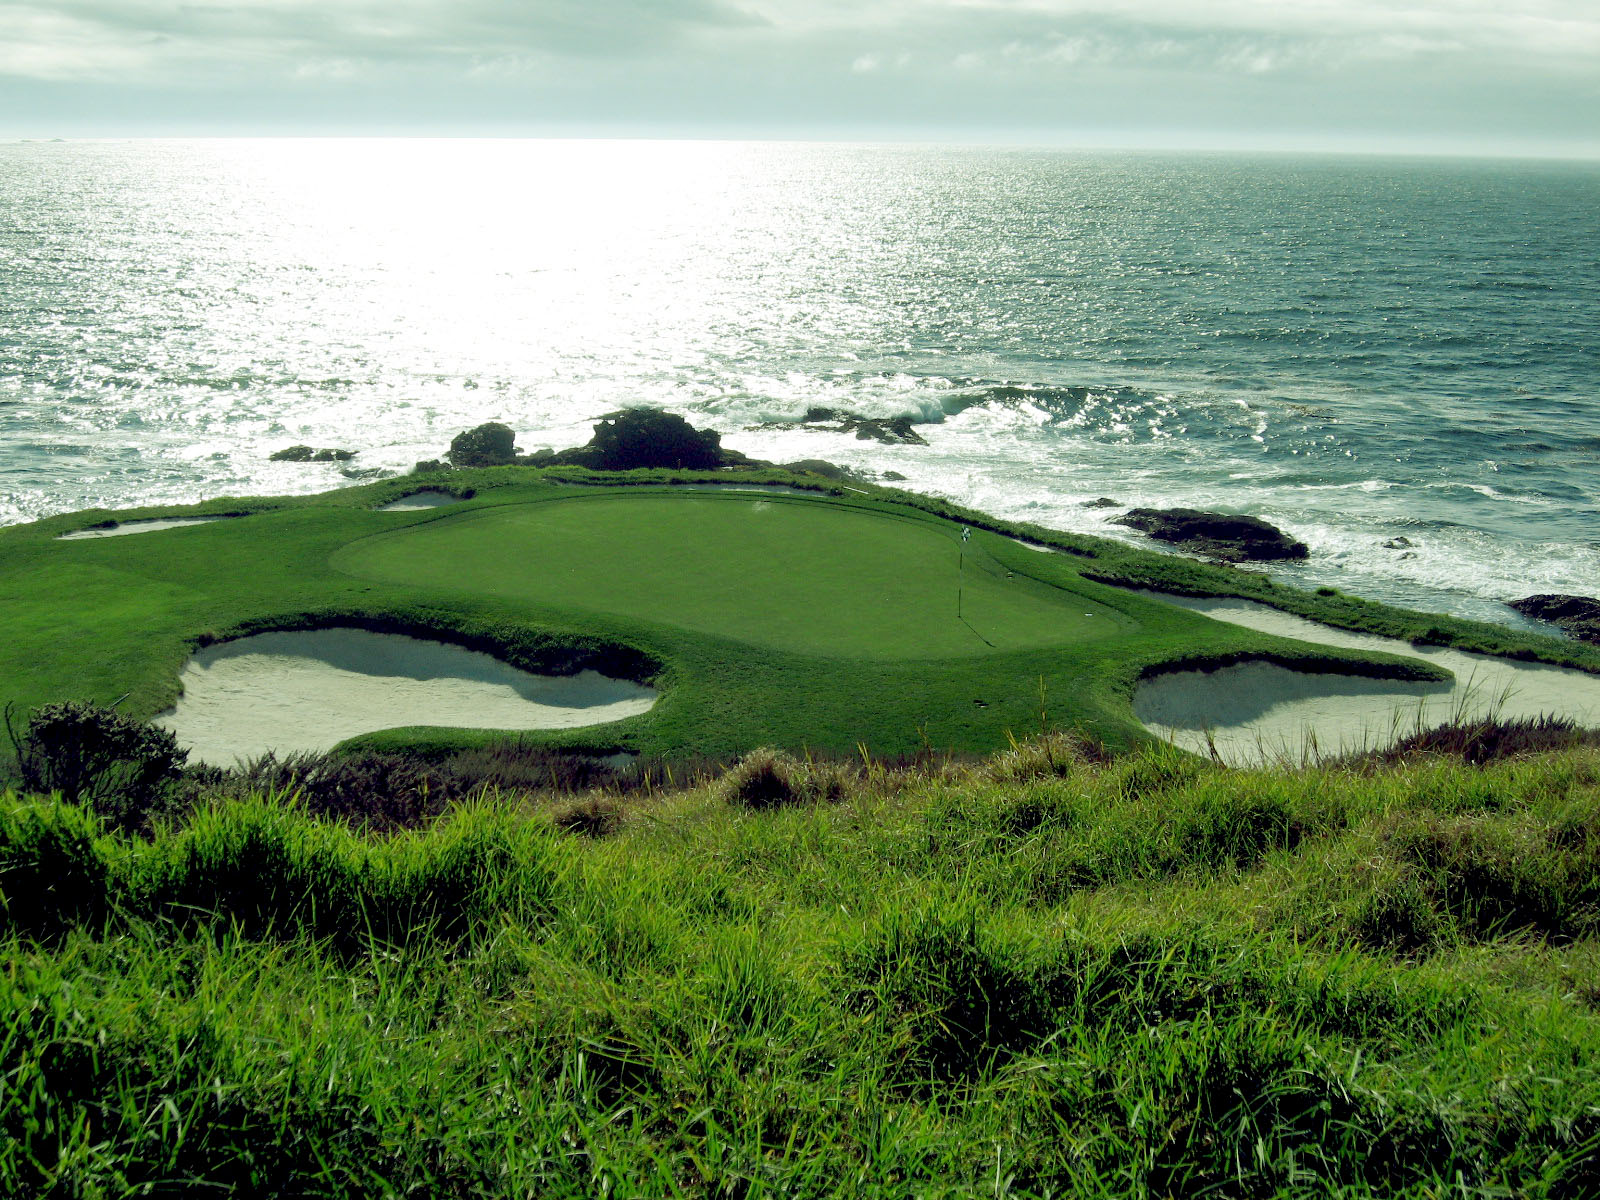 Pebble Beach Golf Course Desktop Wallpaper 1600x1200